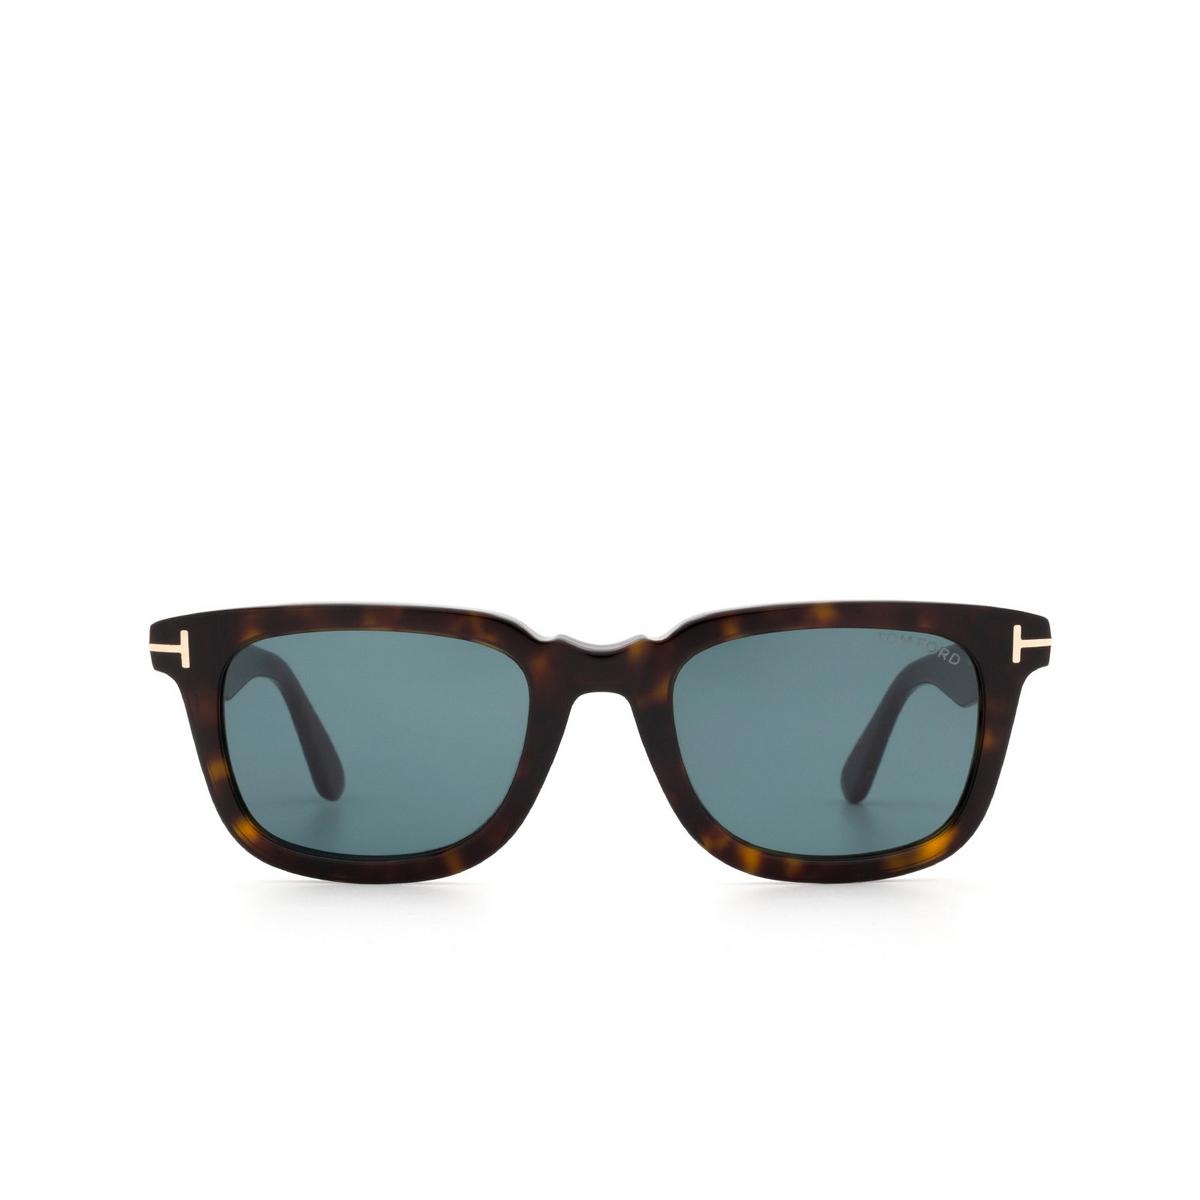 Tom Ford® Rectangle Sunglasses: Dario FT0817 color Dark Havana 52V - front view.